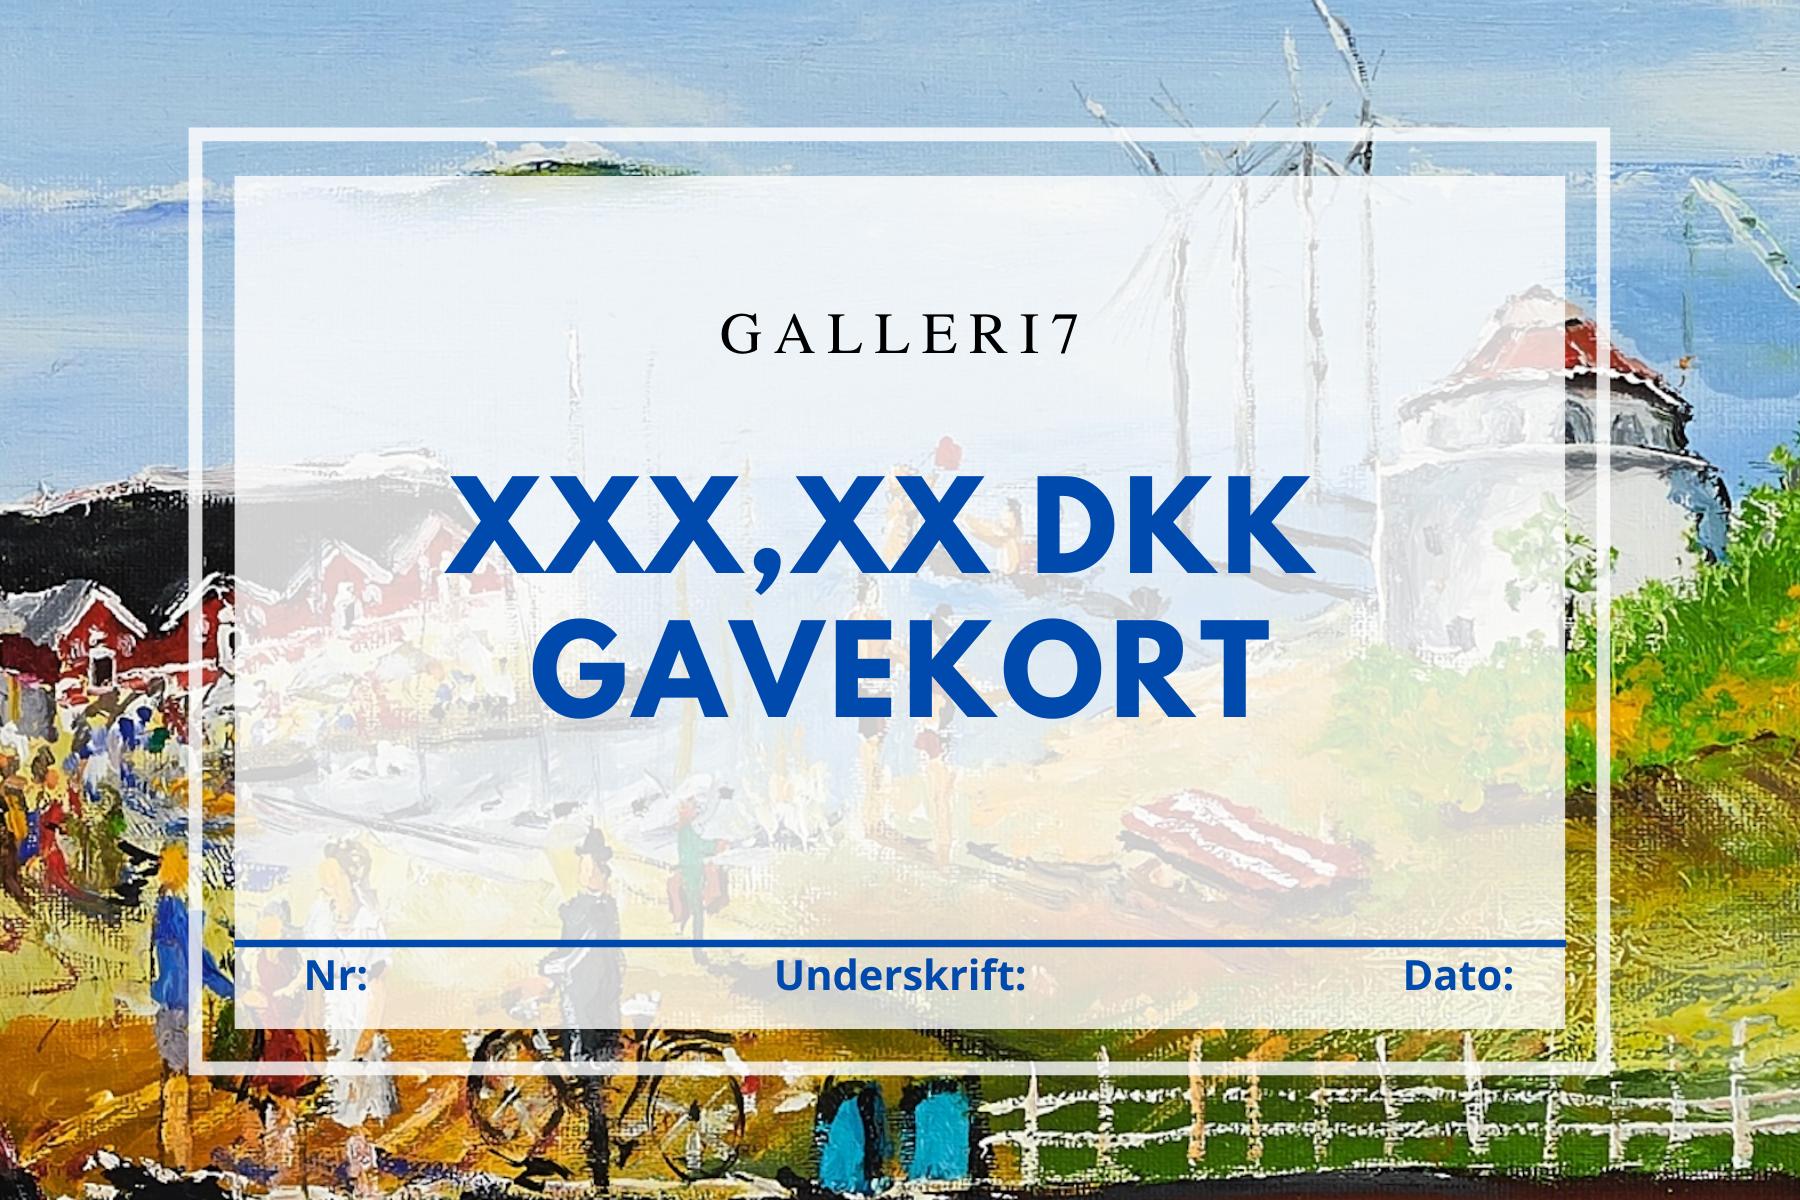 Gavekort Galleri7